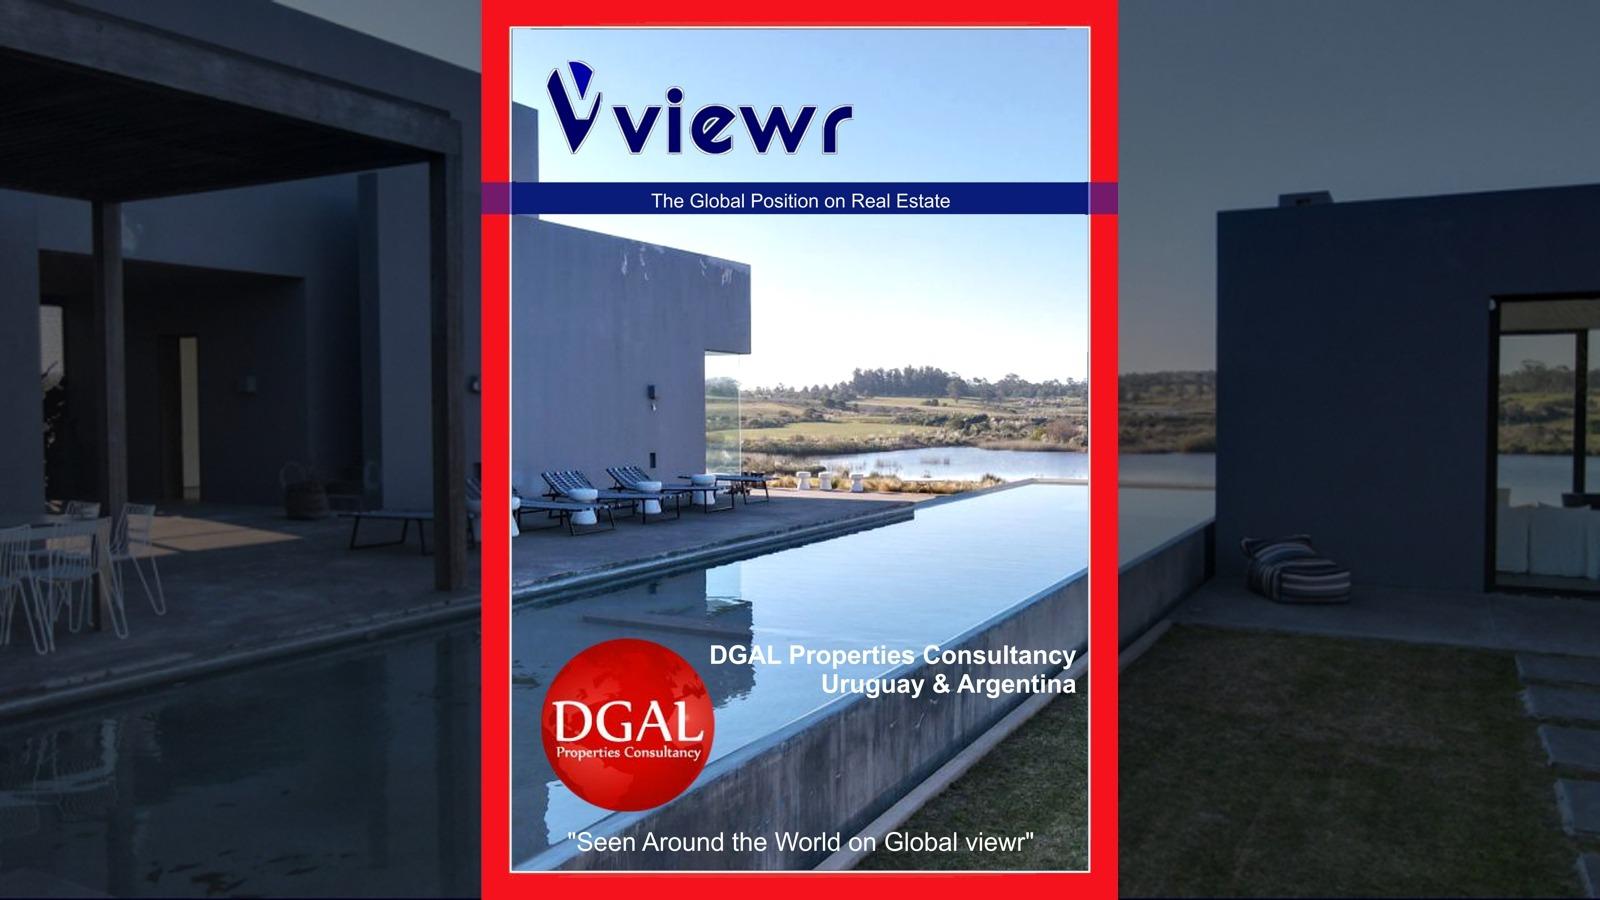 Global viewr Magazine DGAL Consultancy Argentina Uruguay Five Blocks Luxury Villa